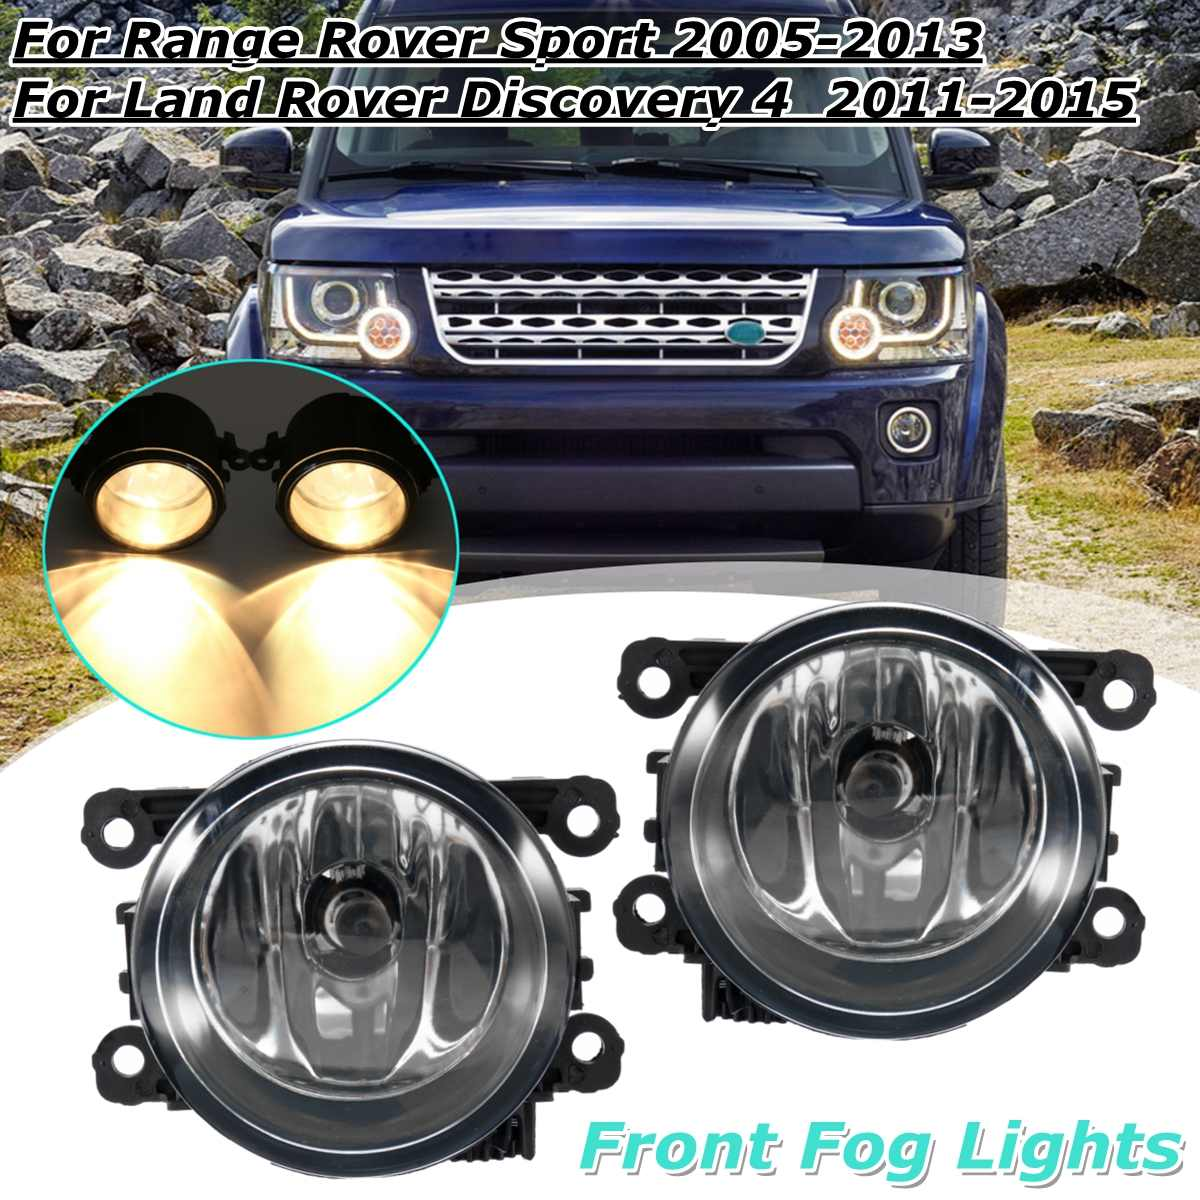 Land Range Rover Evoque descubrimiento Sport Derecho RH Parachoques Delantero Lámpara LED Foglight